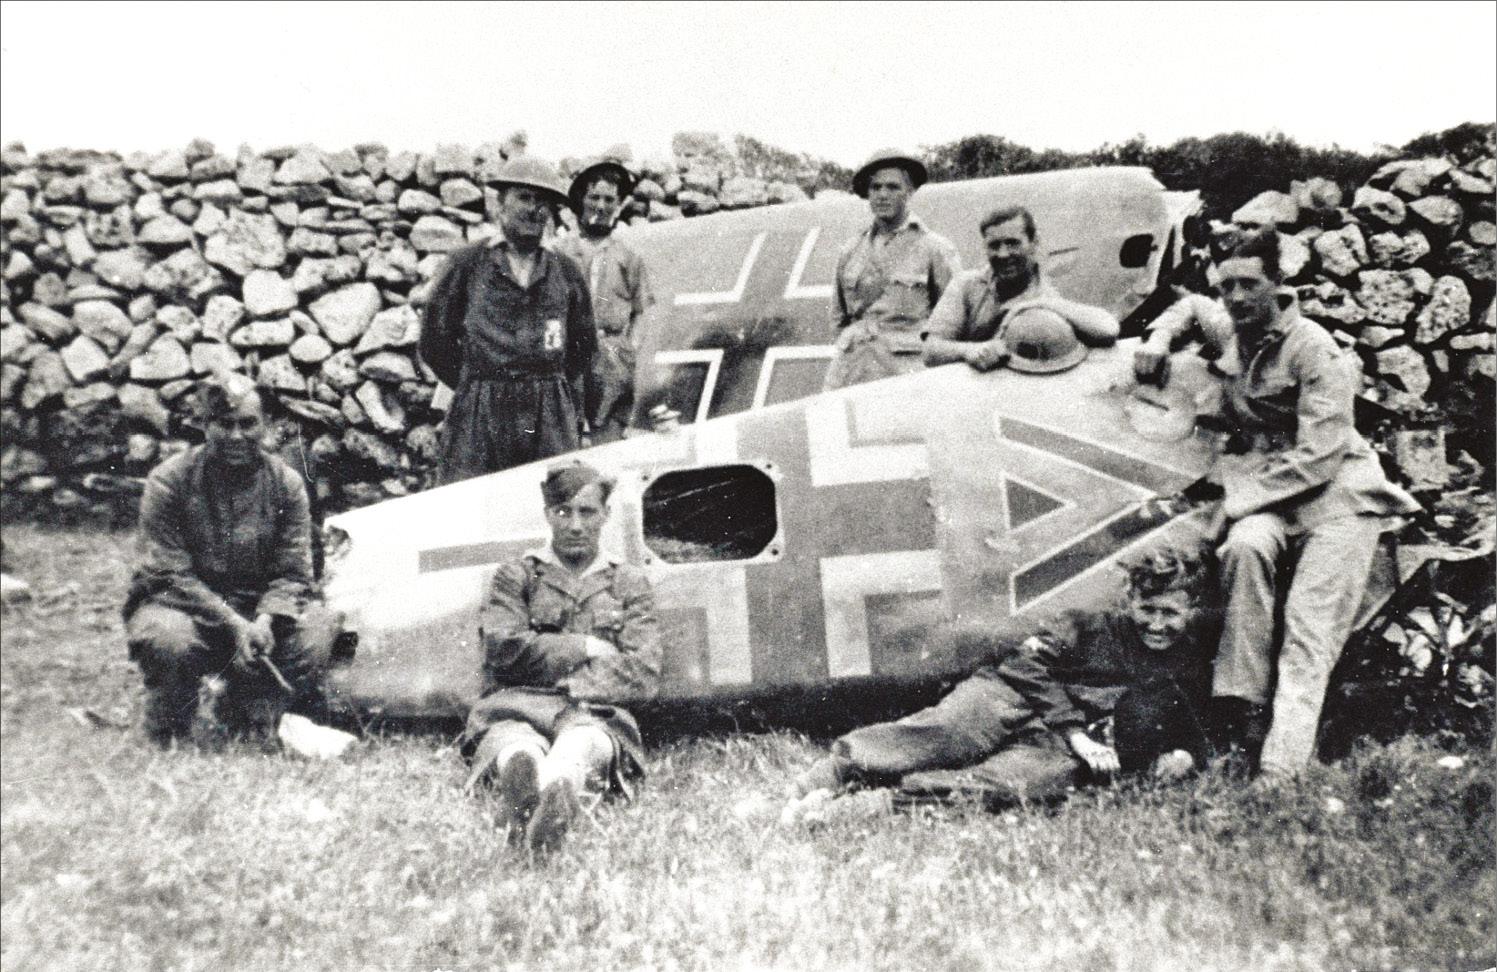 BELOW Wreckage of Hauptmann Krahl's Bf 109, with the distinctive Gruppenkommandeur chevron/triangle on the fuselage.